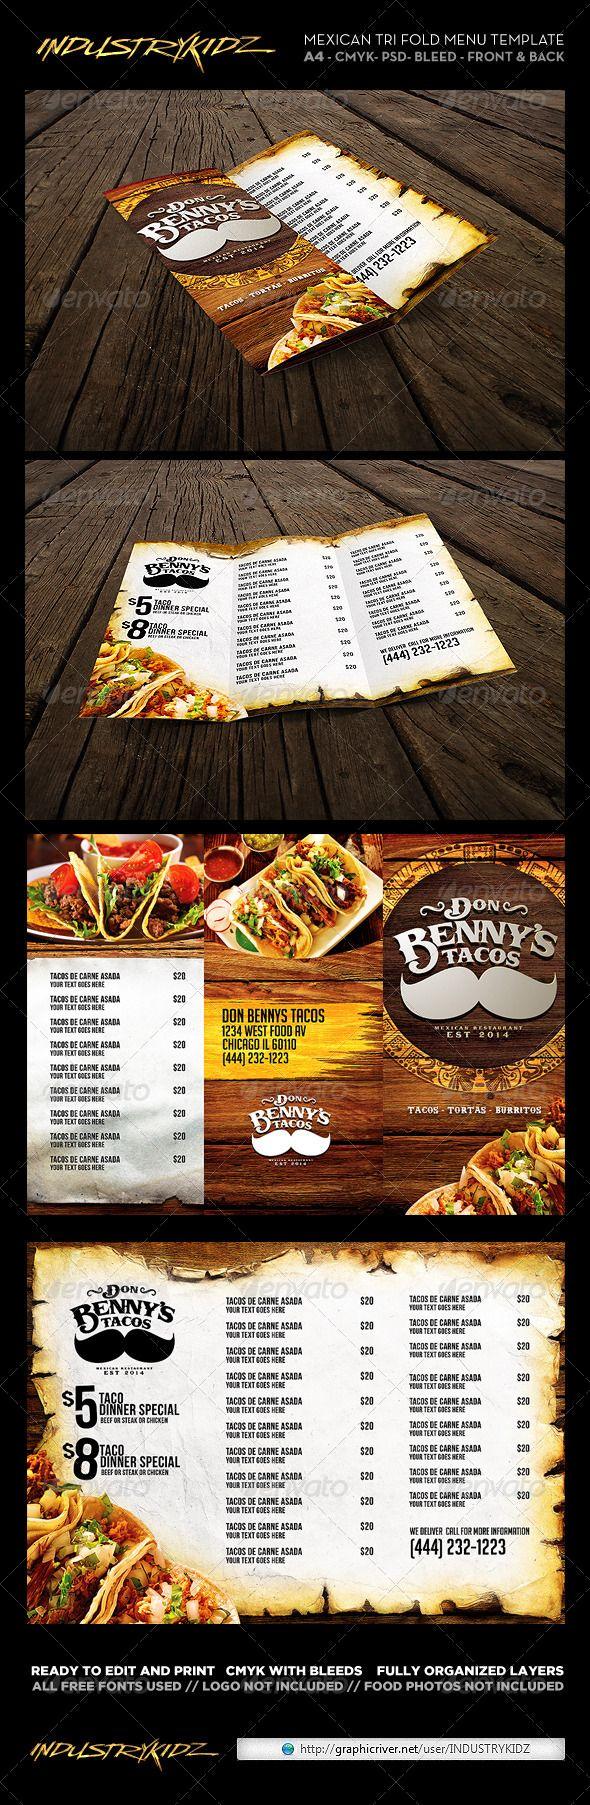 Trifold Mexican Menu Template #design #alimentationmenu Download: http://graphicriver.net/item/trifold-mexican-menu-template/6745168?ref=ksioks